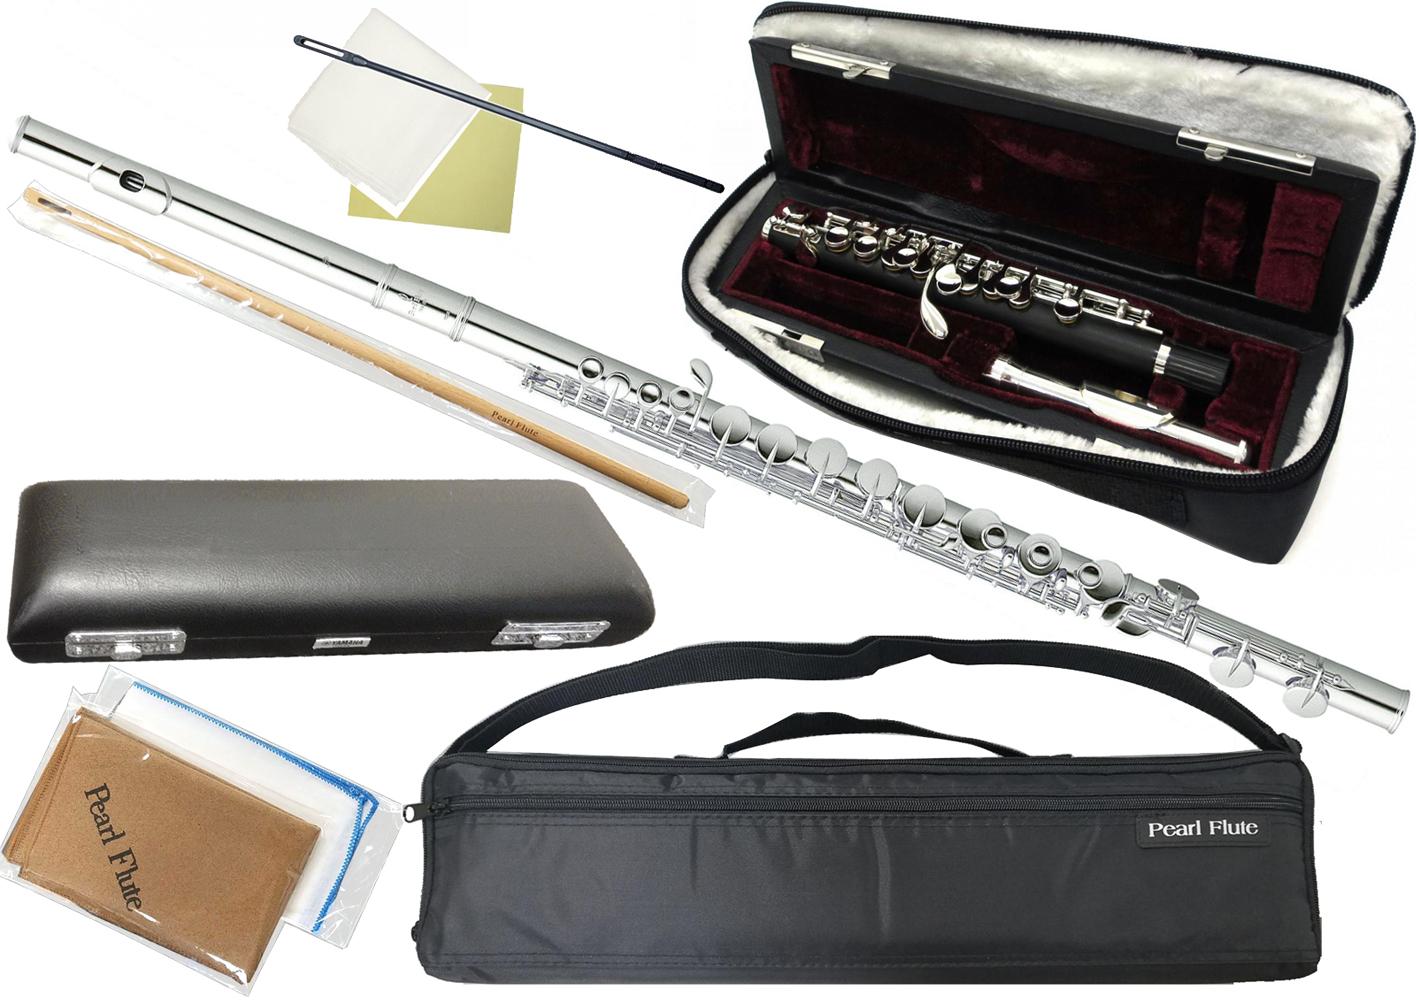 Pearl Flute ( パールフルート ) PFA-206ES アルトフルート 頭部管 銀製 Ag925 ストレート頭部管 Eメカニズム G足部管 銀製頭部管 alto flute PFA206ES セット C 送料無料(代引き不可)